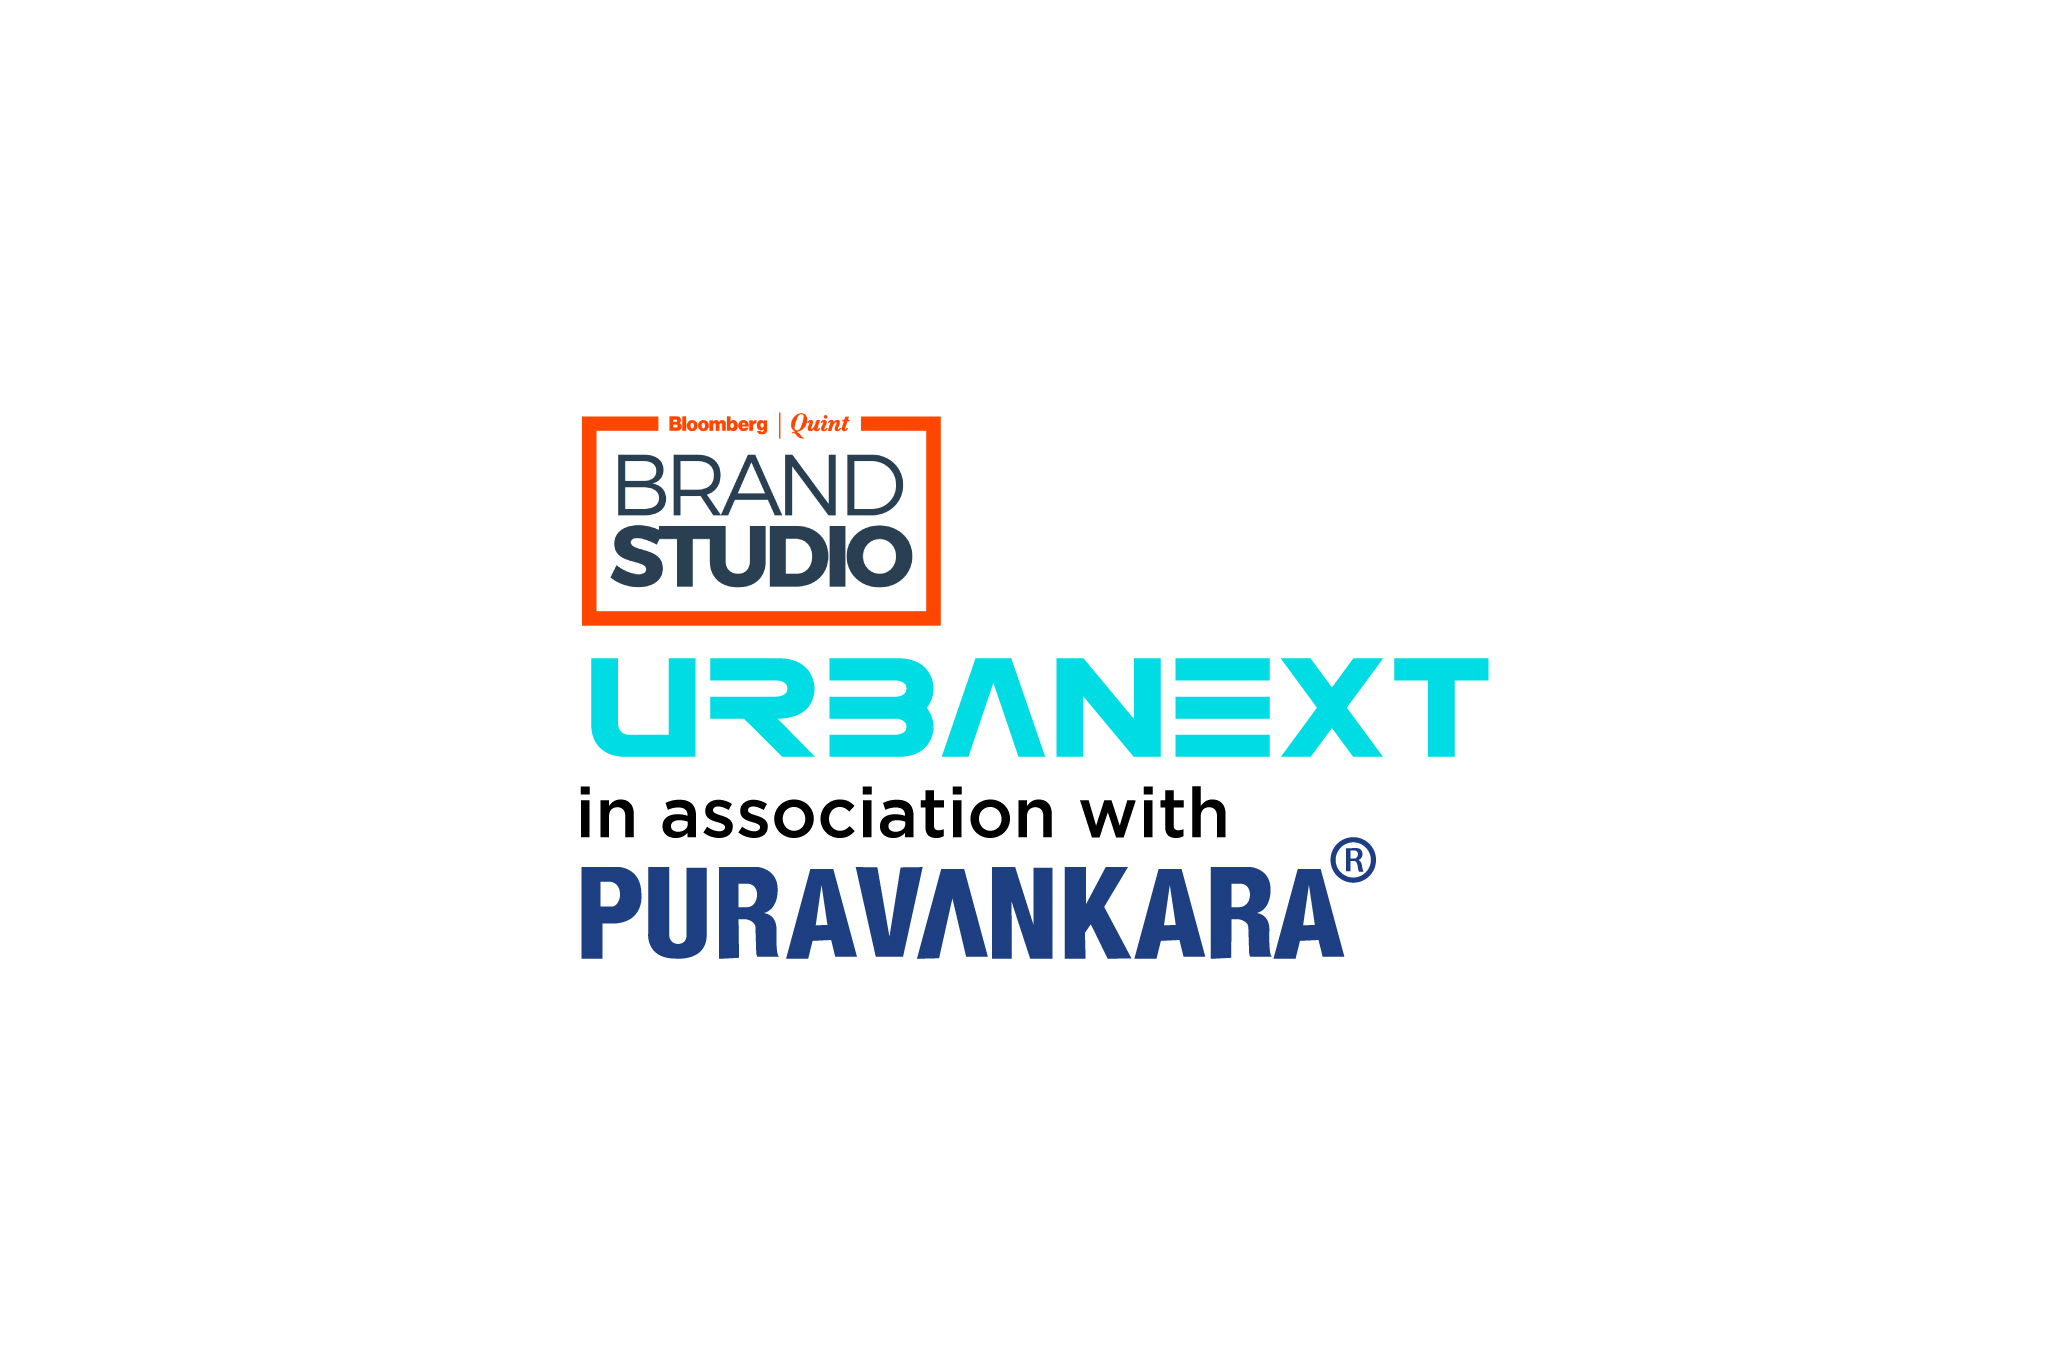 UrbaNext (by Puravankara)